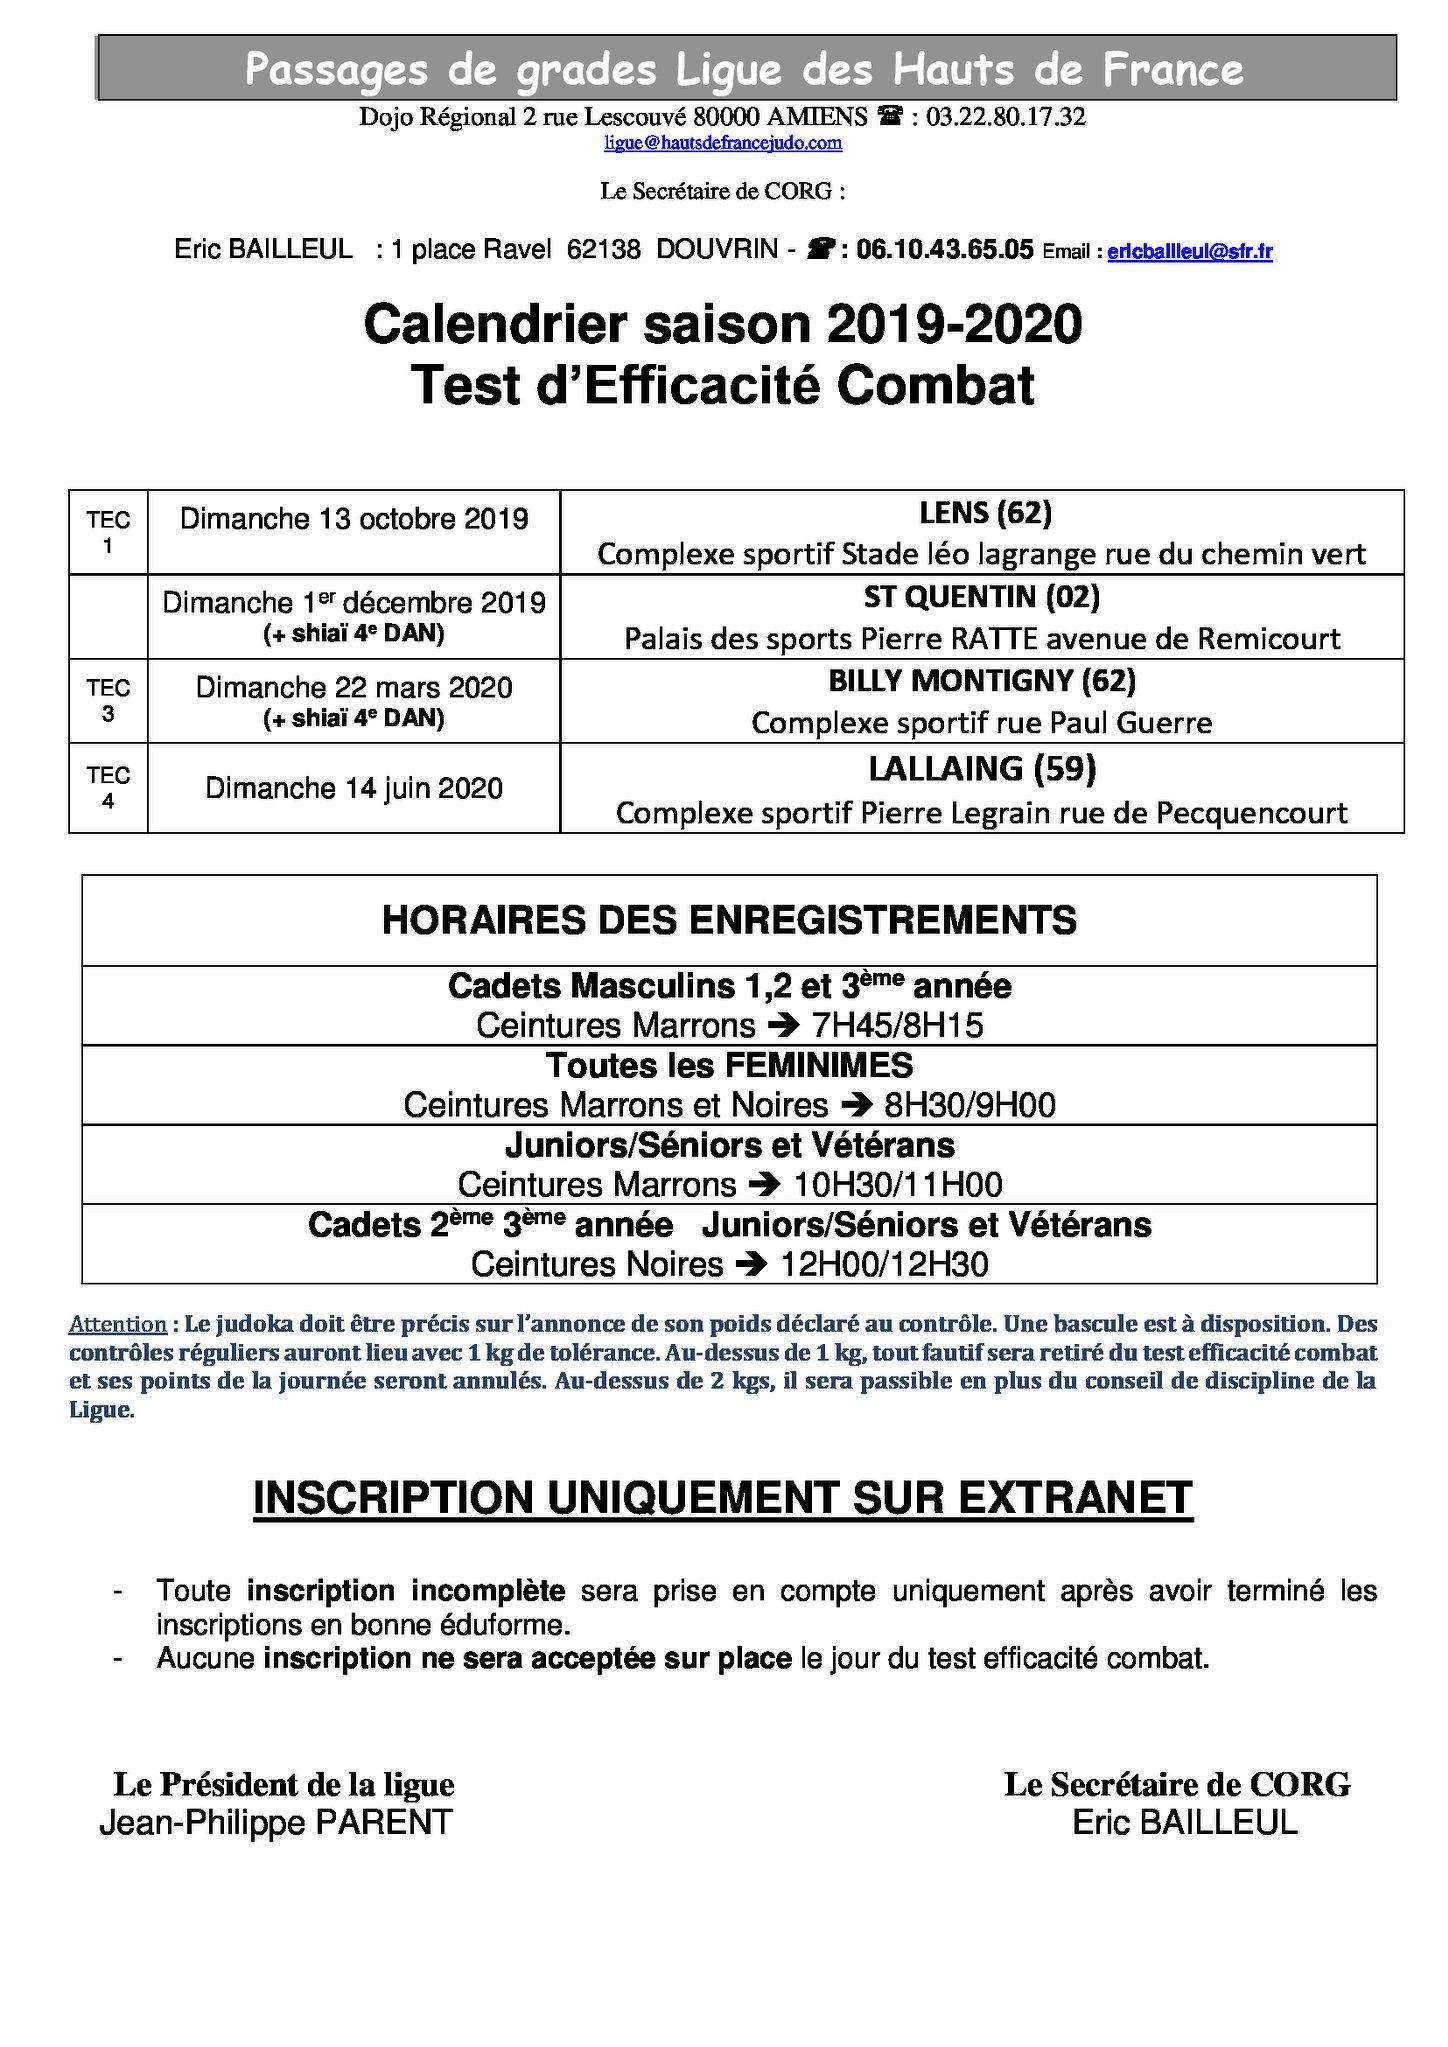 Calendrier Saison 2020.Calendrier Saison 2019 2020 Des Examens Uv 3 Test D